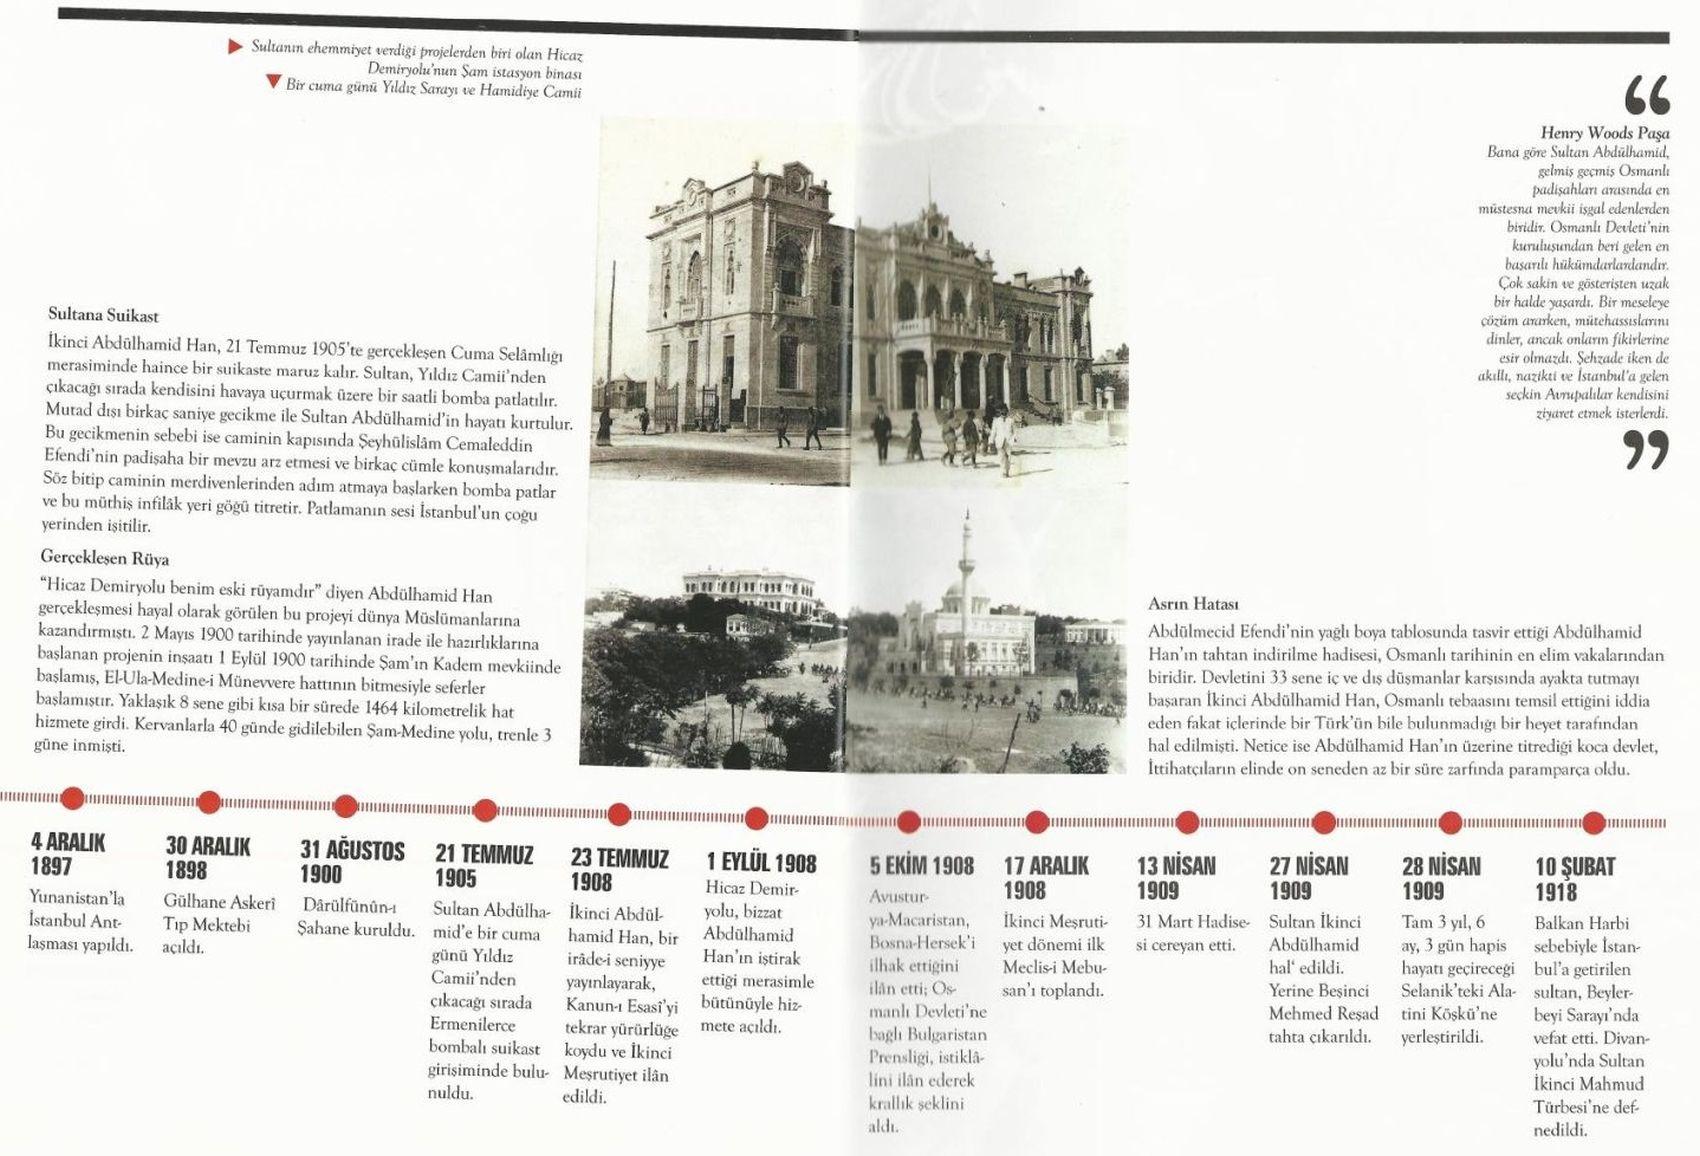 0369-sultan-abdulhamid-vefatinin-100-yili-yedi-kita-dergisi-abdulhamid-belgeseli (9)